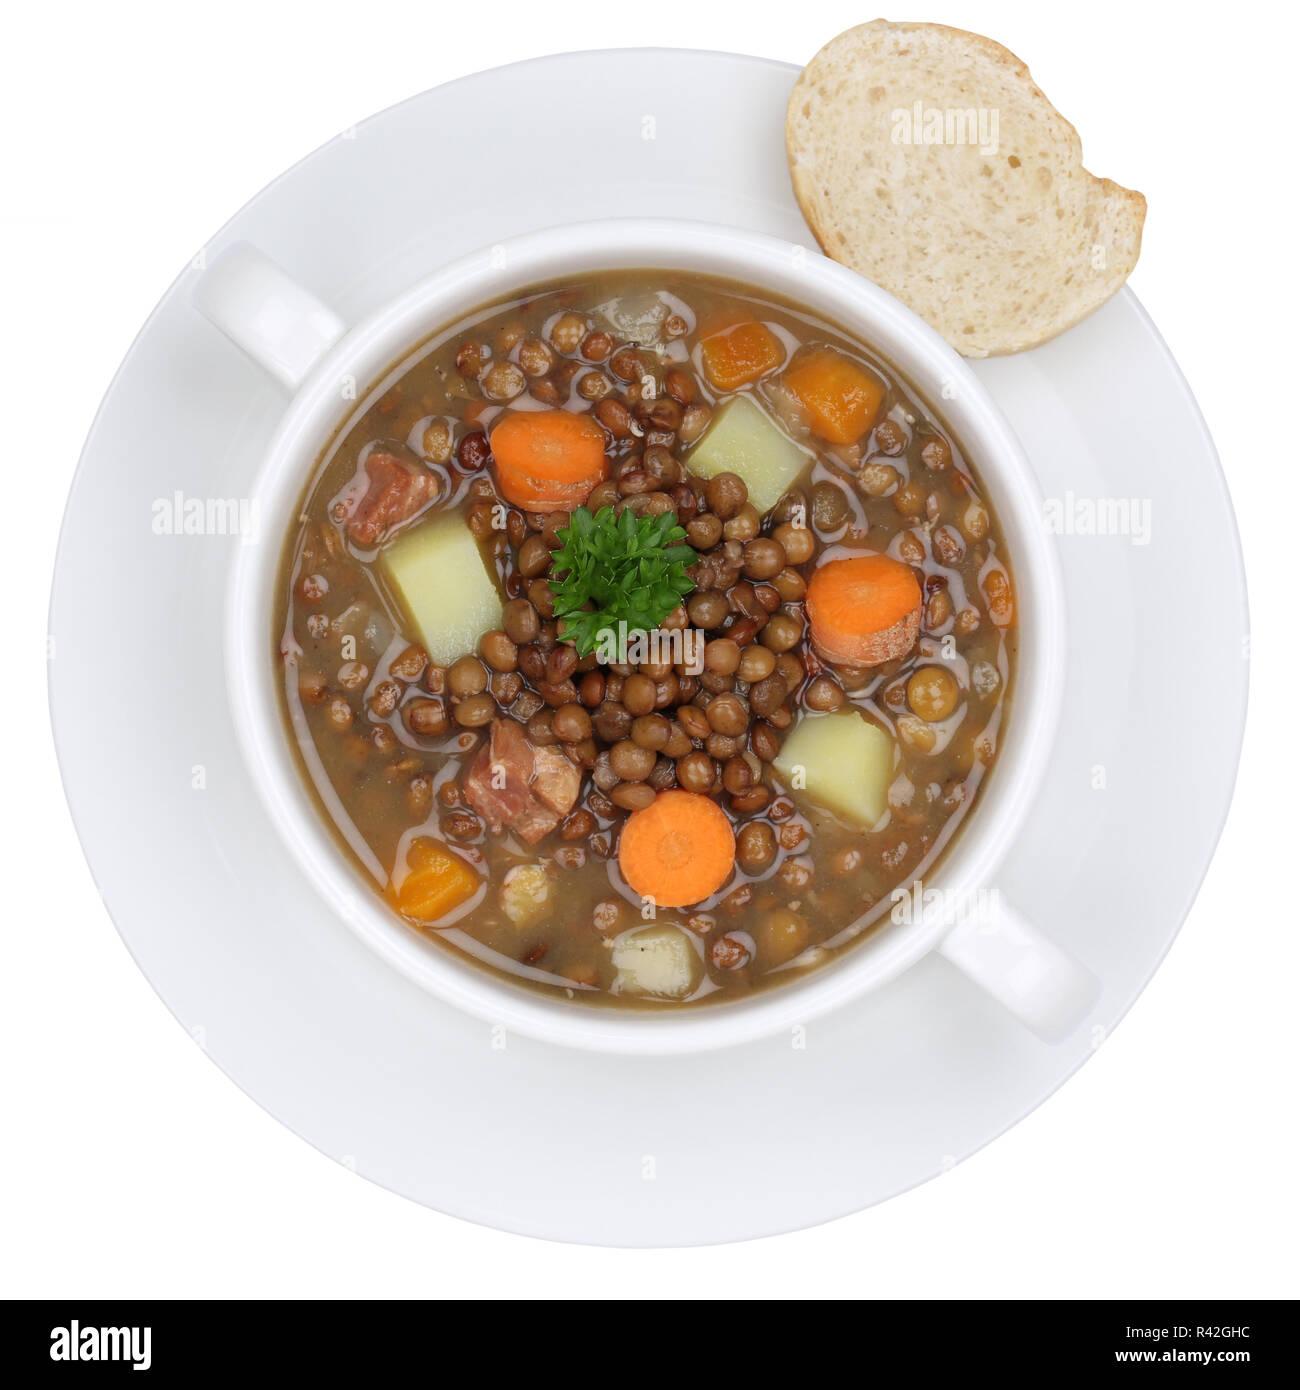 lentil lentils soup in soup bowl cut from the top Stock Photo